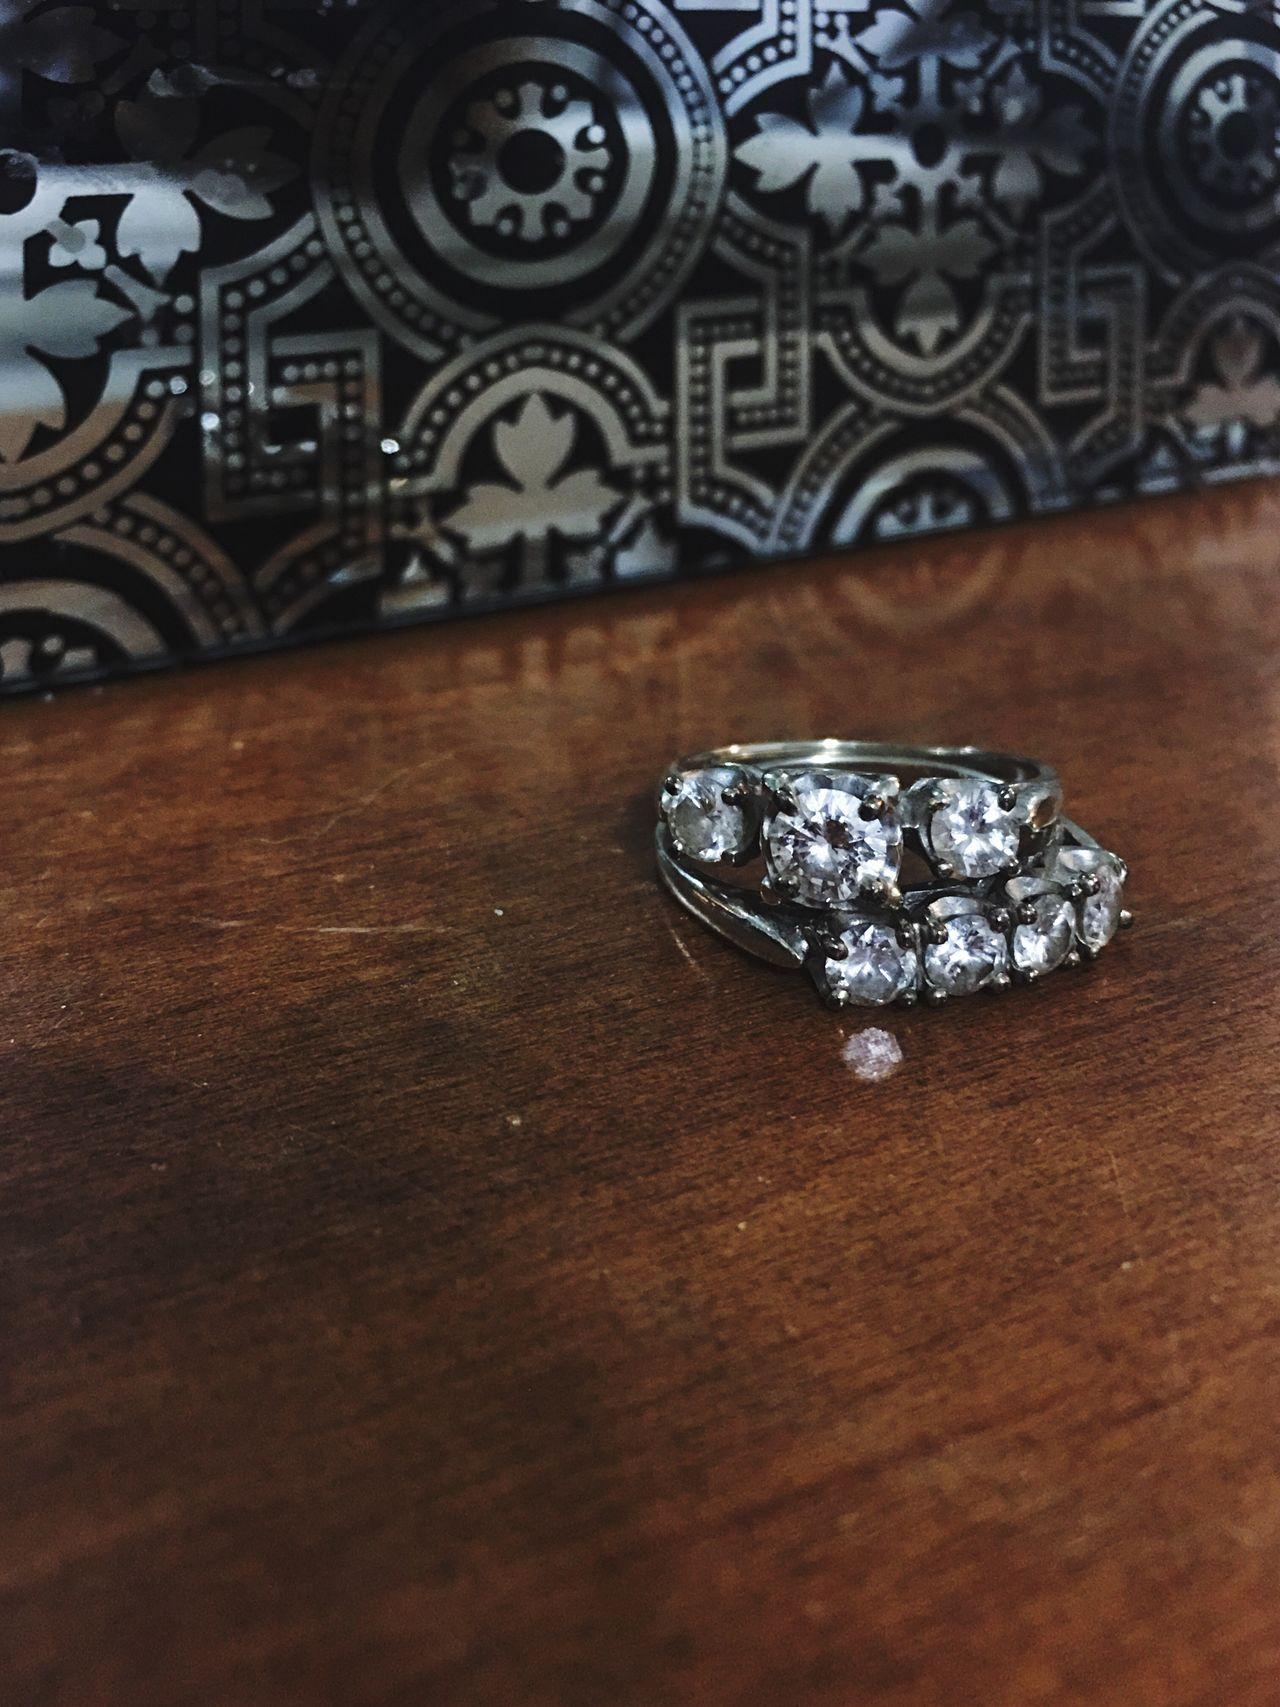 Grandma Aline's rings 🙏 Rip Vintage Frenchwoman Twin Flames Marriage  Love Antique No People 1945 Diamond Jewelry Truelove Beautiful Regalo De Mi Abuelo